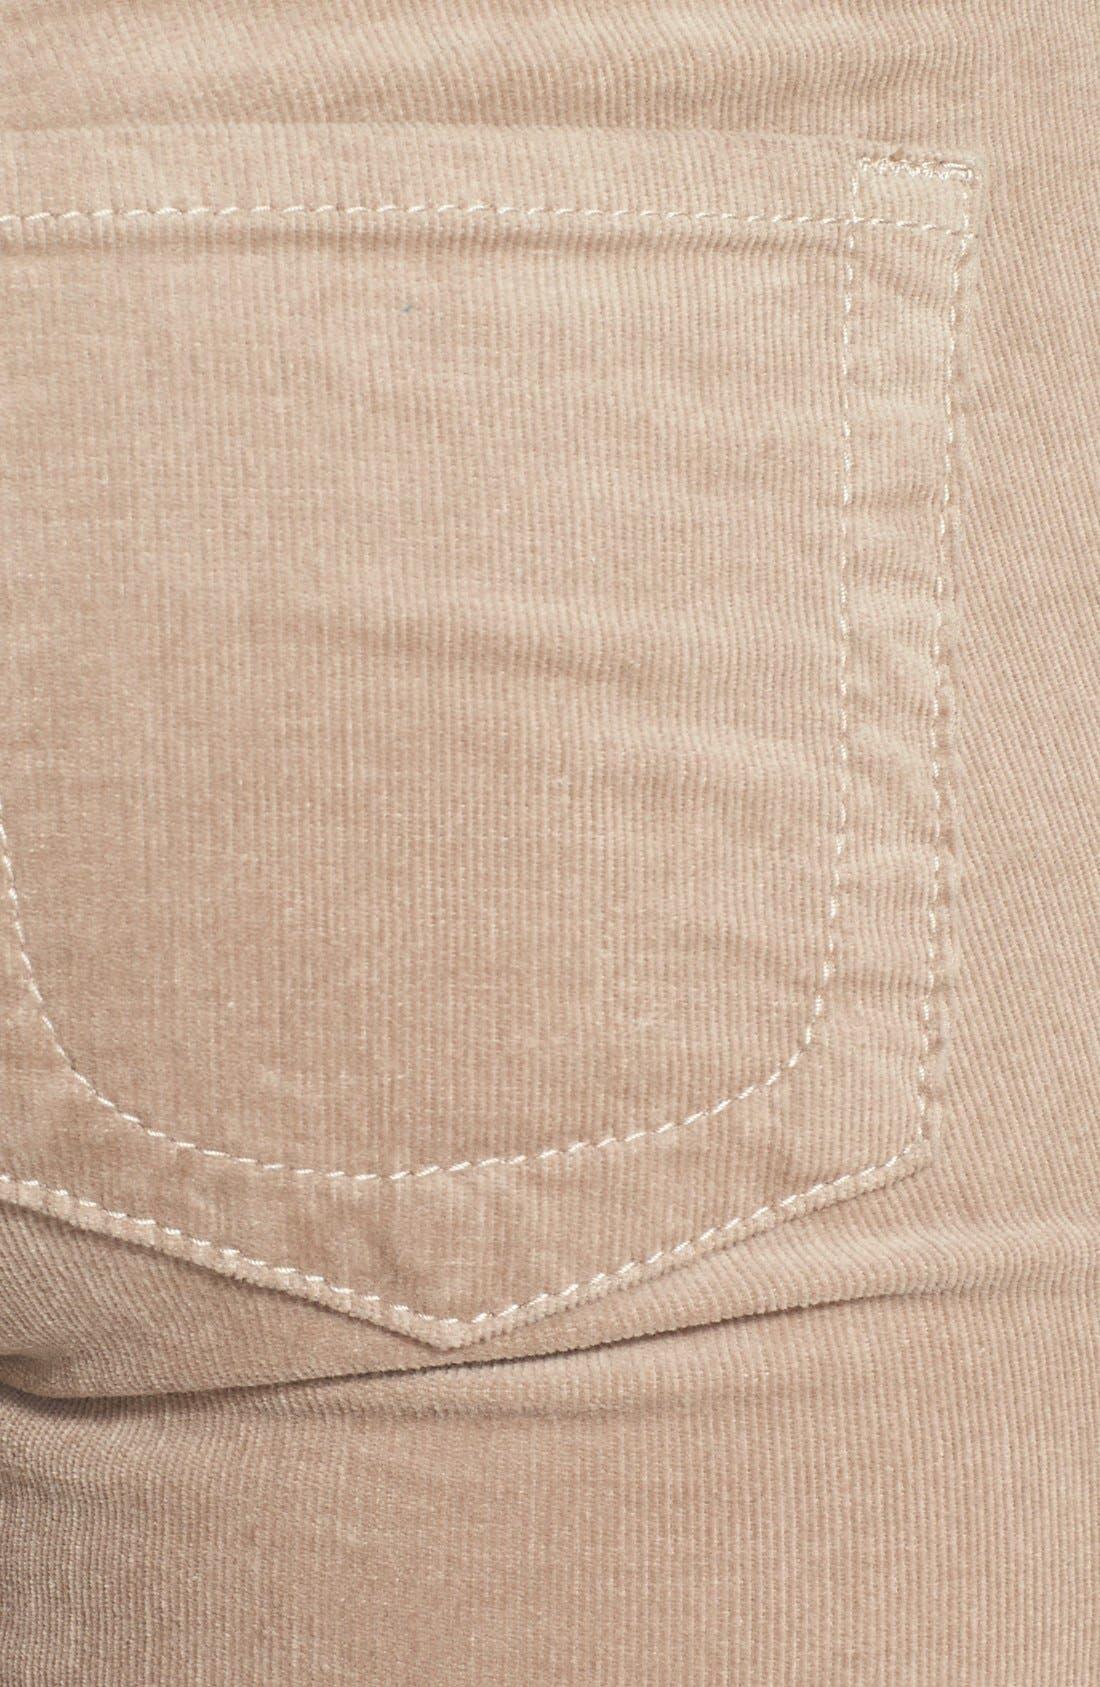 'Diana' Stretch Corduroy Skinny Pants,                             Alternate thumbnail 228, color,